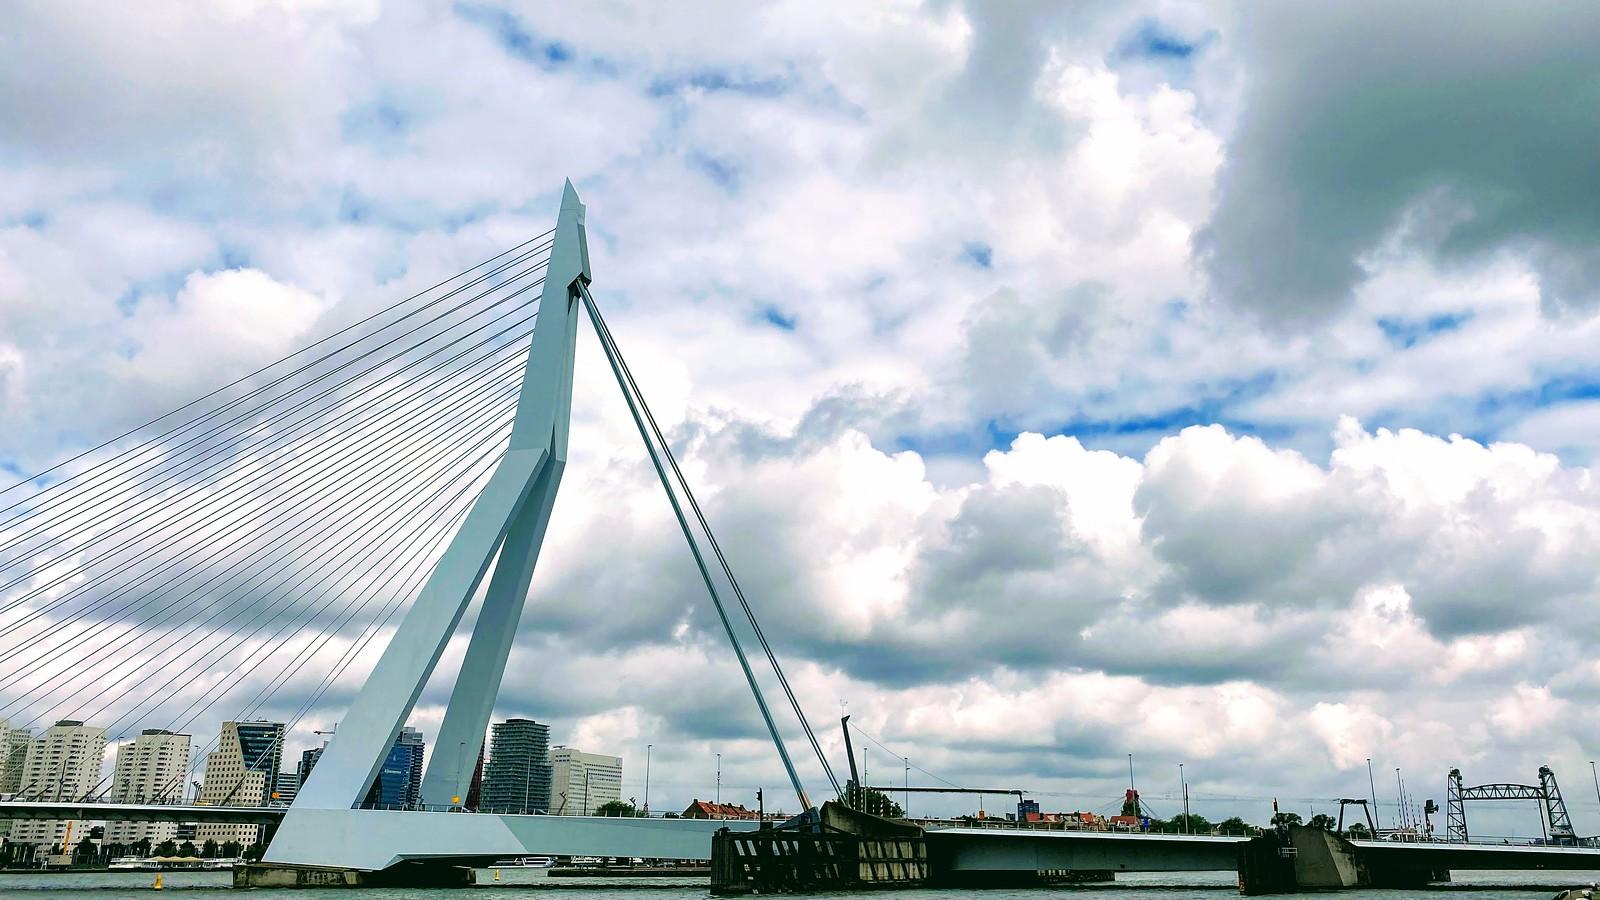 Broek boven Rotterdam - willem haring